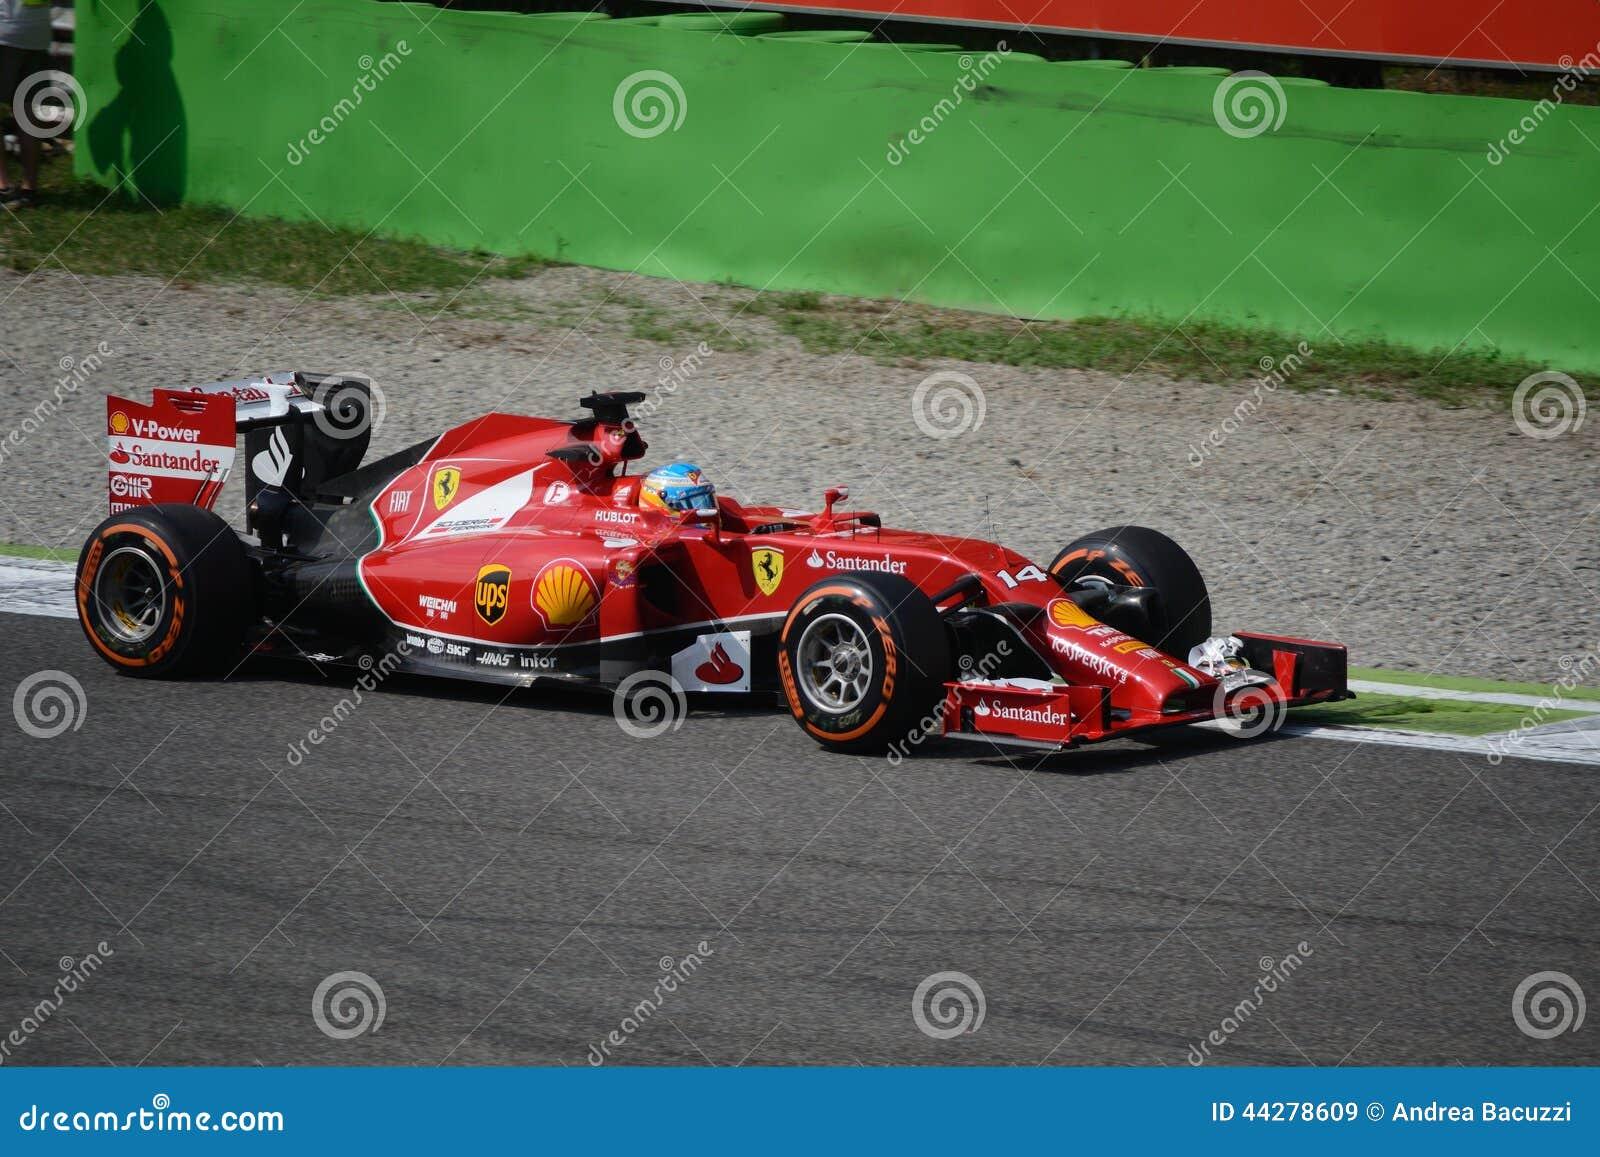 2014 F1 Monza Ferrari F14 T - Fernando Alonso